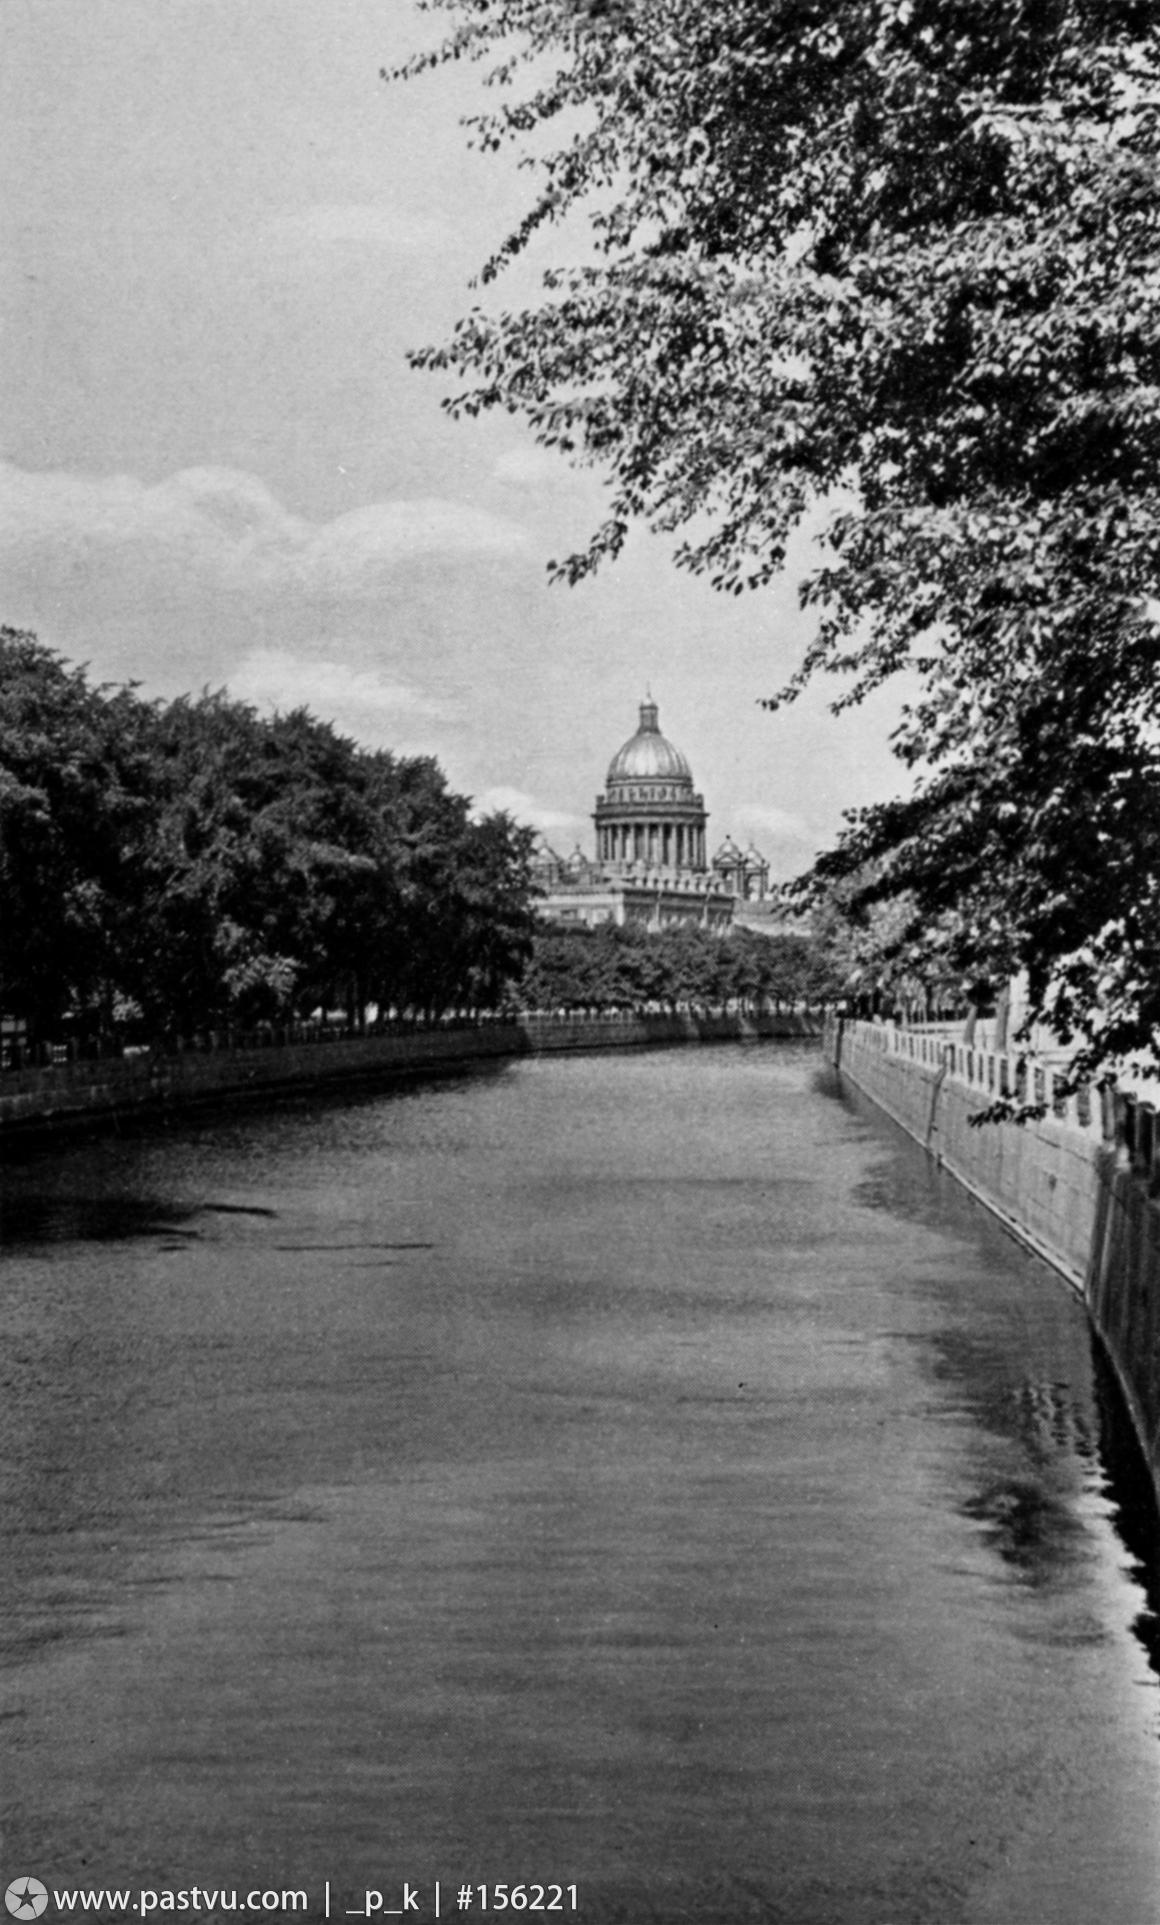 1971 Перспектива р. Мойки, заверш. куполом Исаакиевского собора.jpg